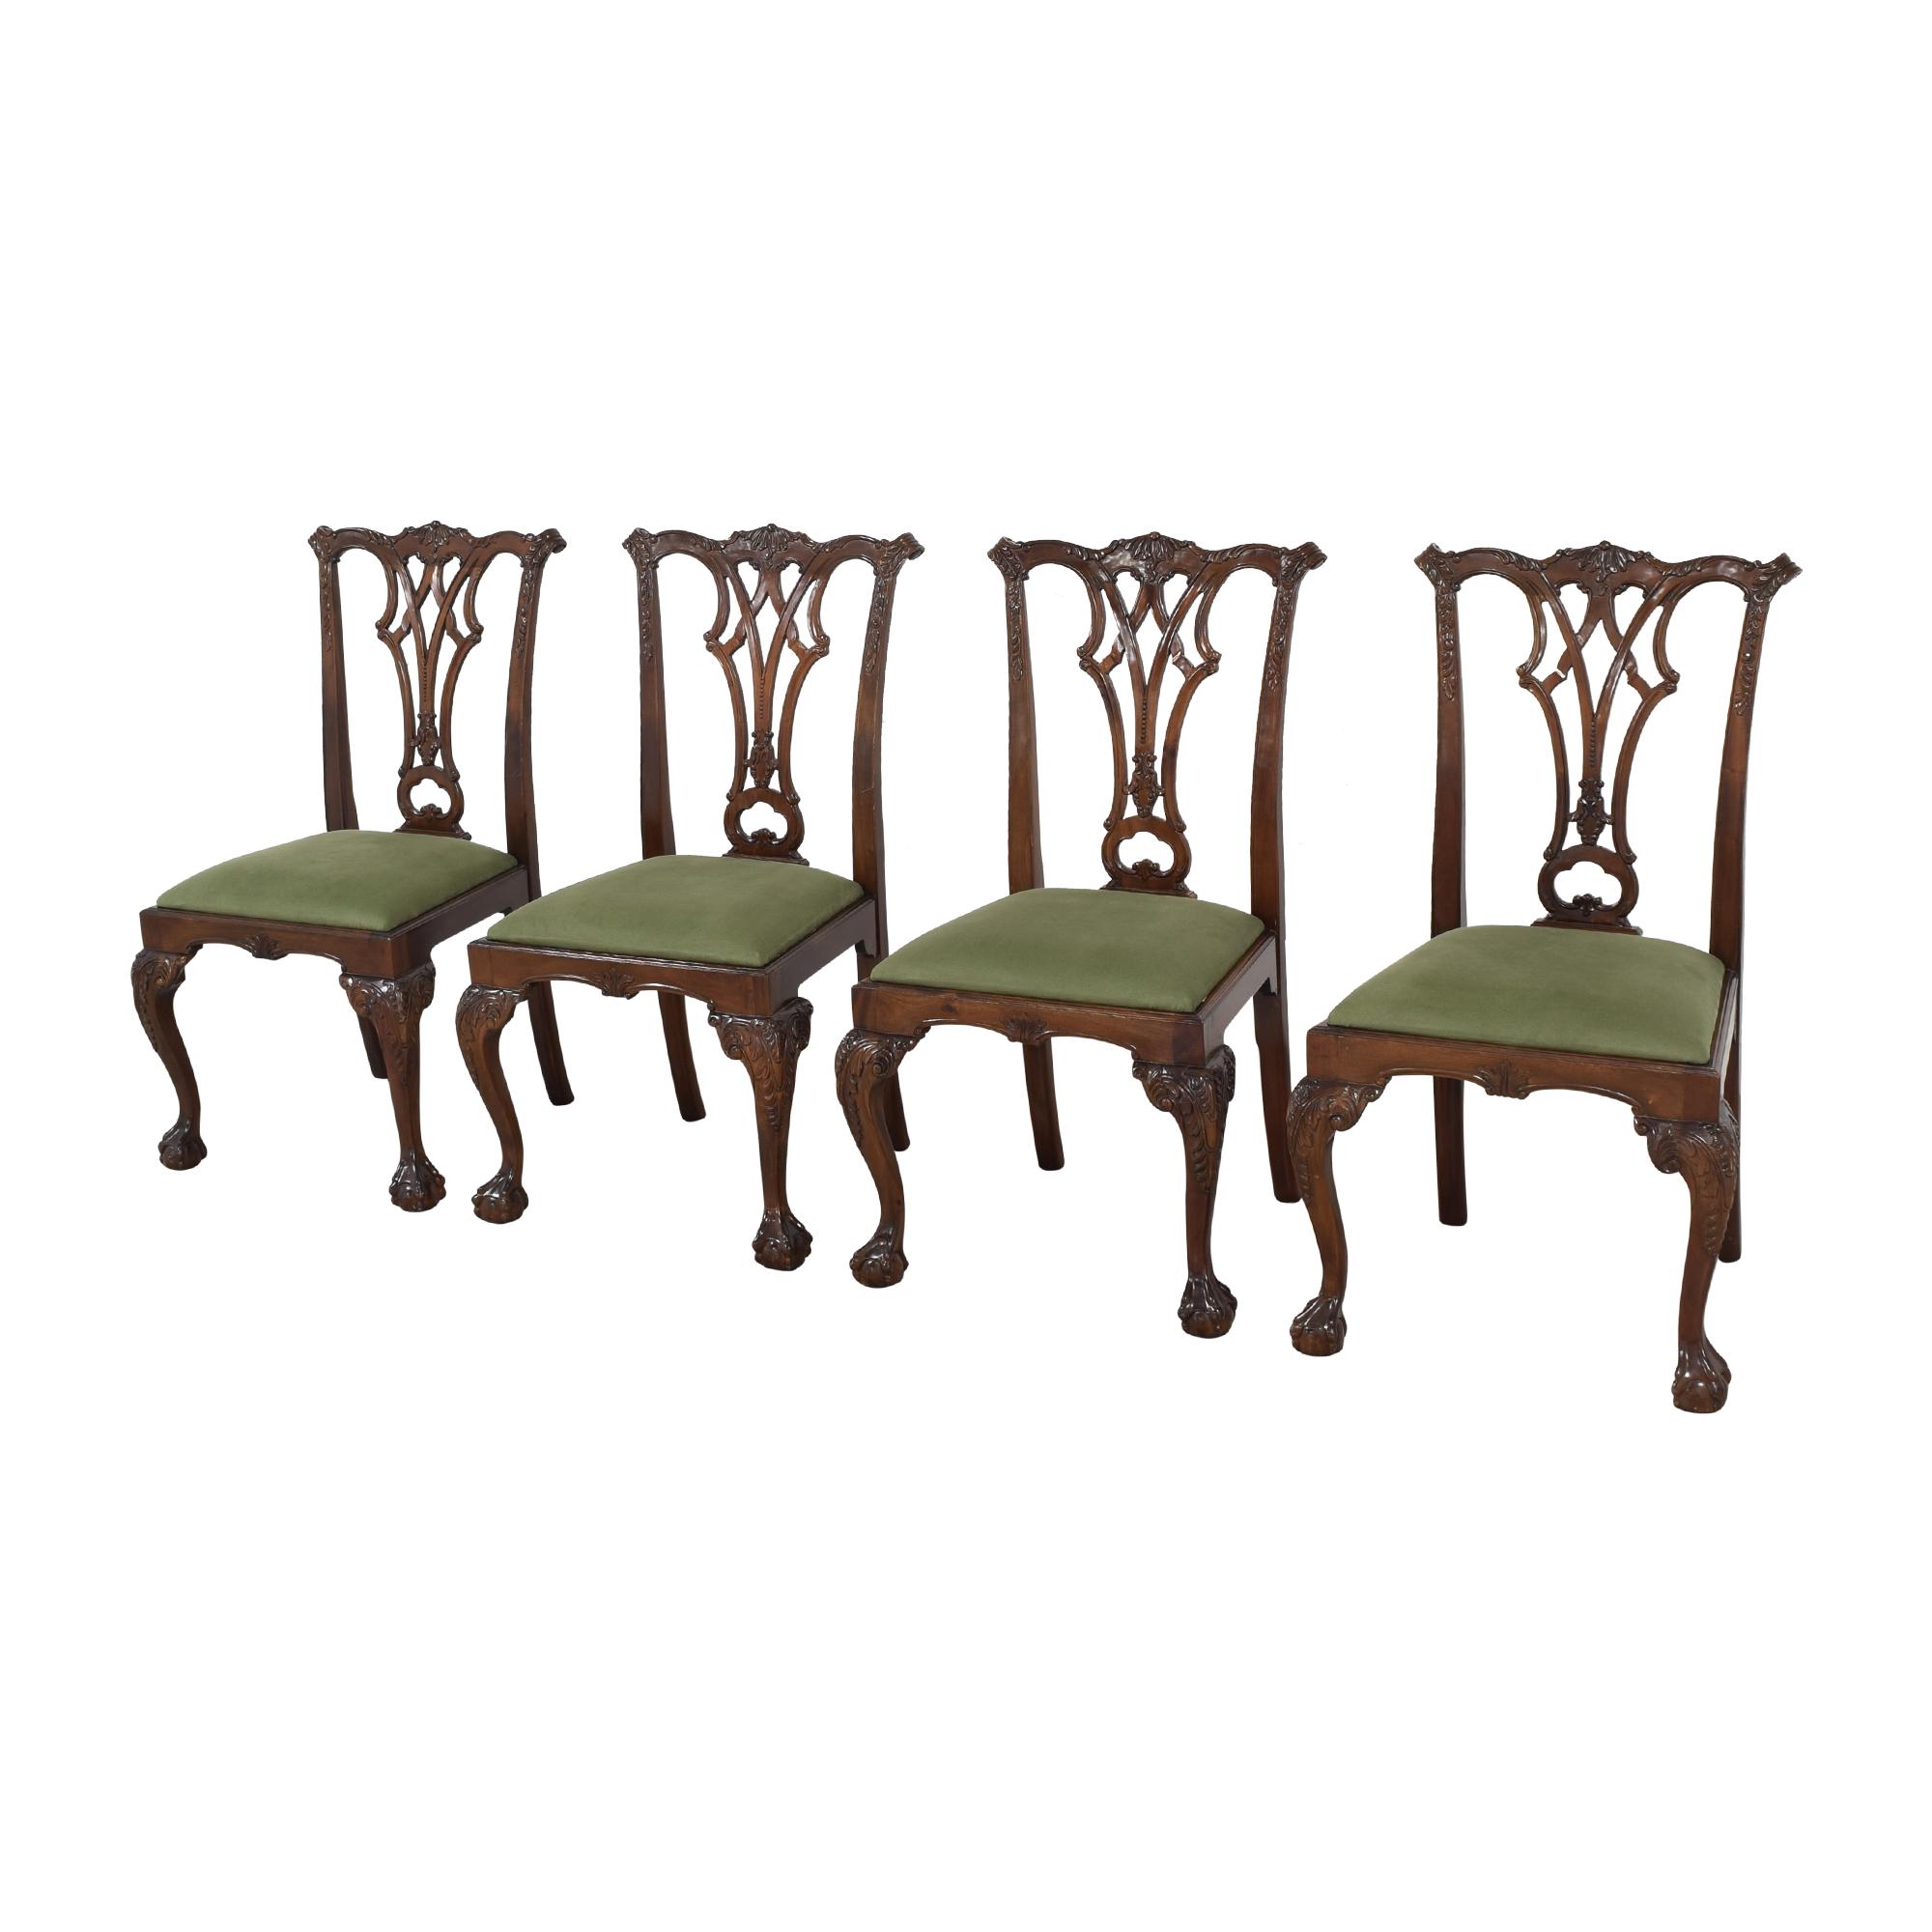 Greenbaum Interiors Greenbaum Interiors Vintage Upholstered Dining Chairs nj